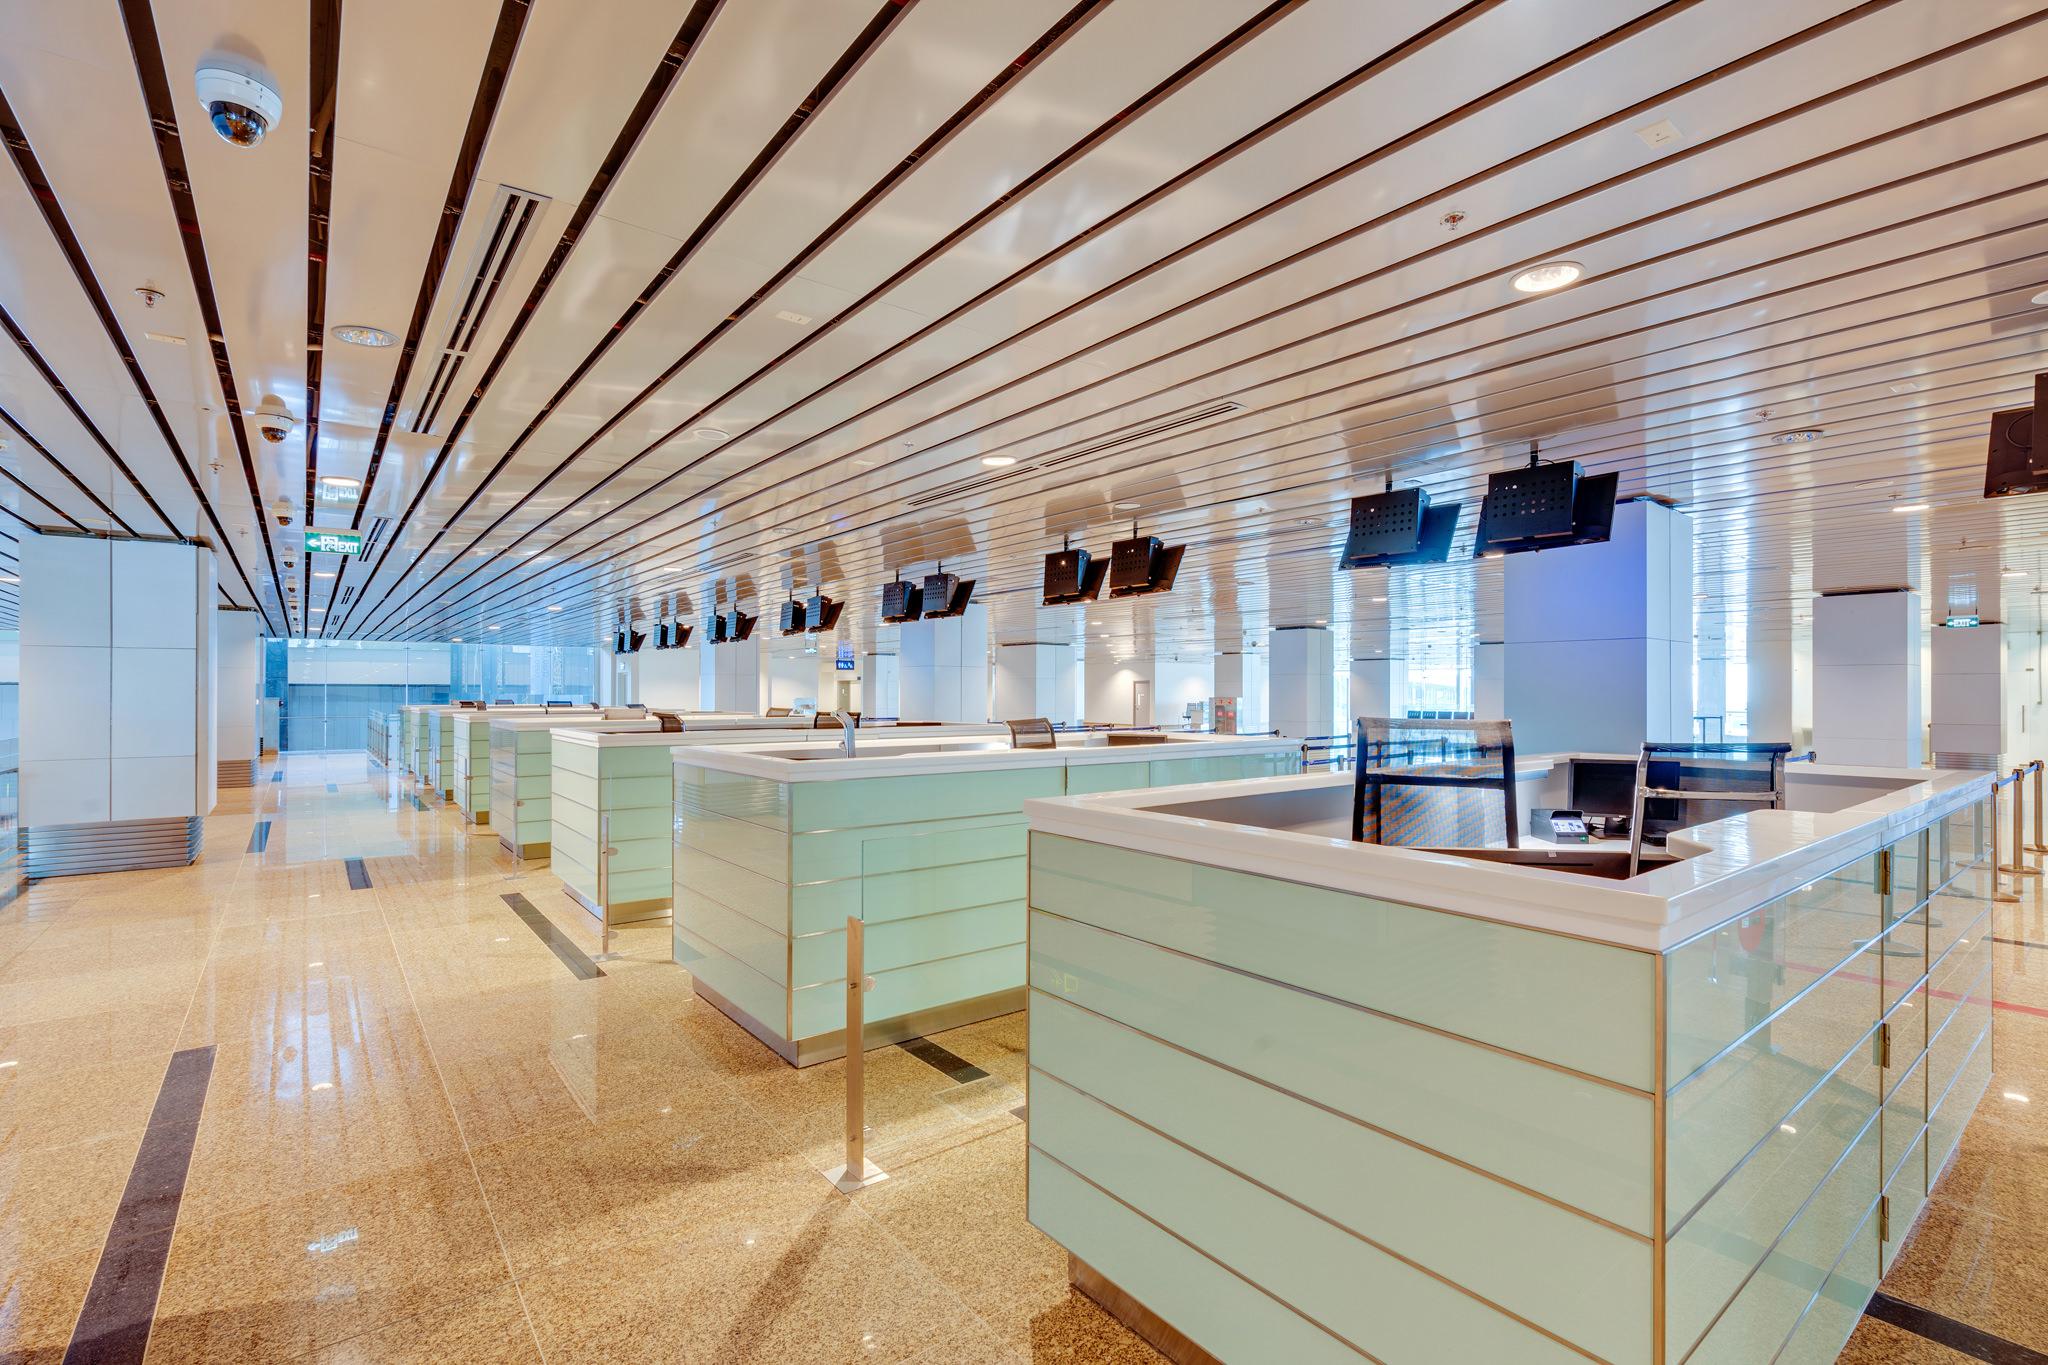 20180626 - Cam Ranh Airport - Architecture - 0147.jpg